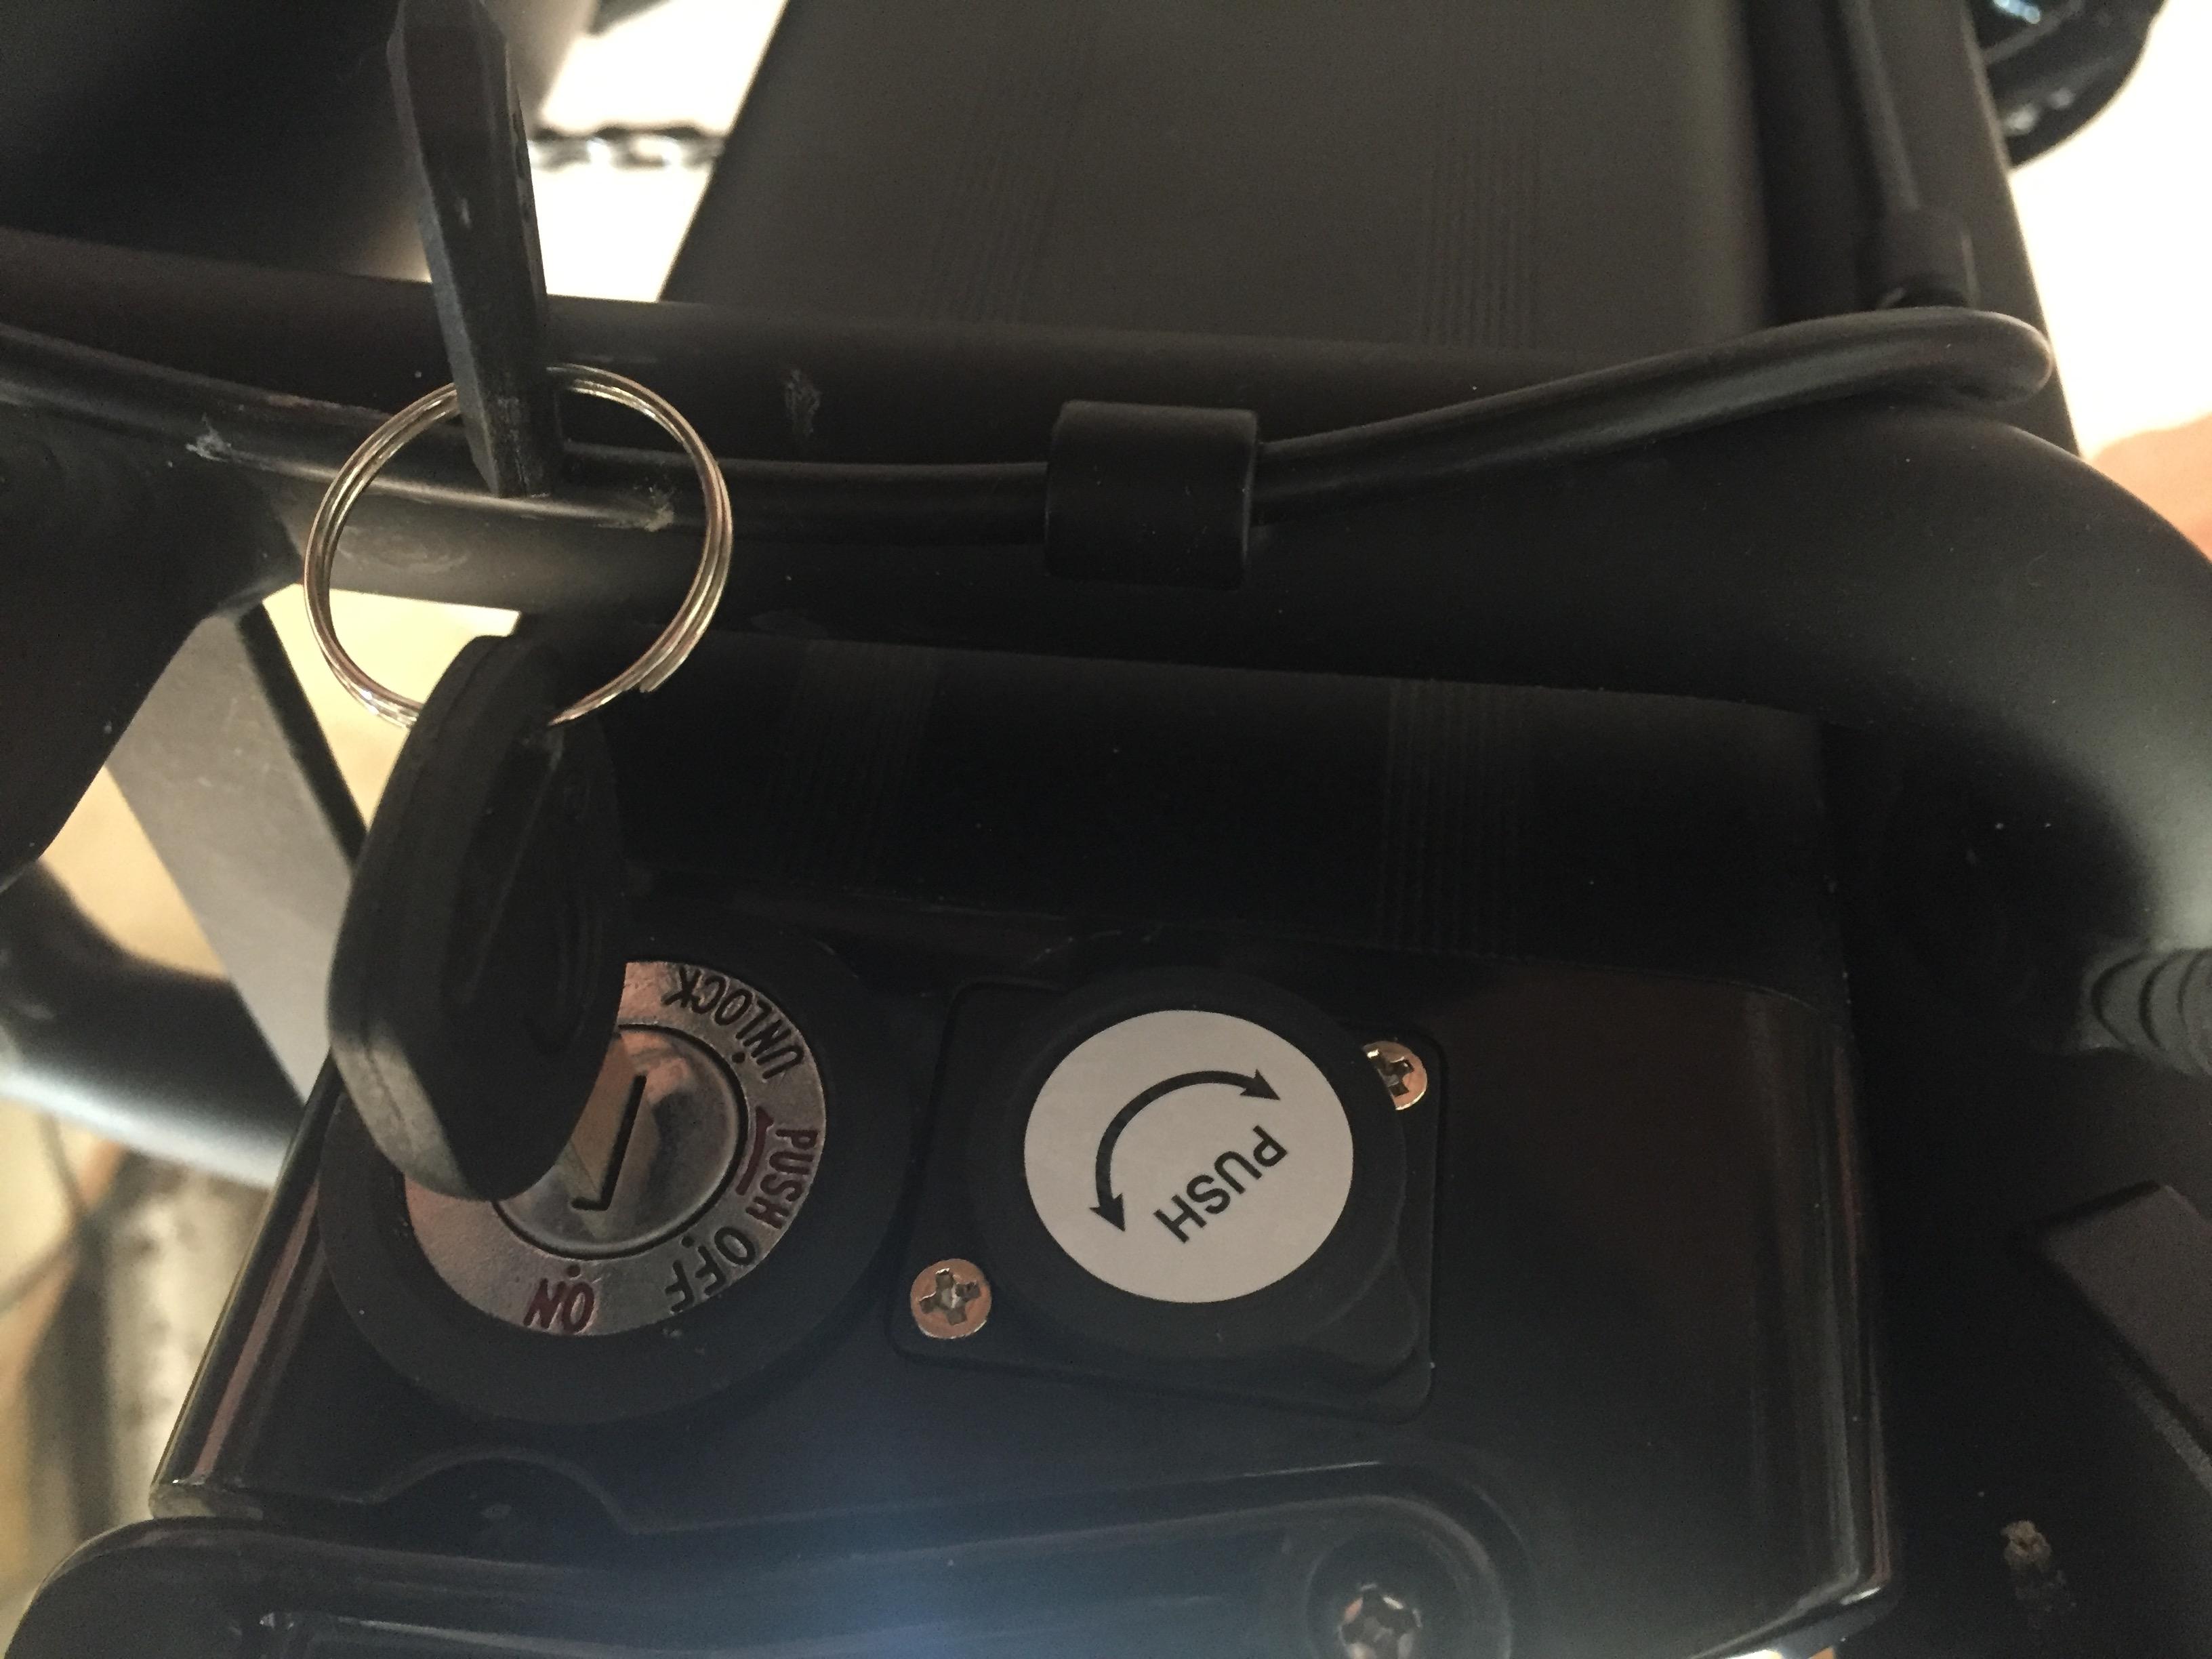 Trek & Traverse Battery with Key